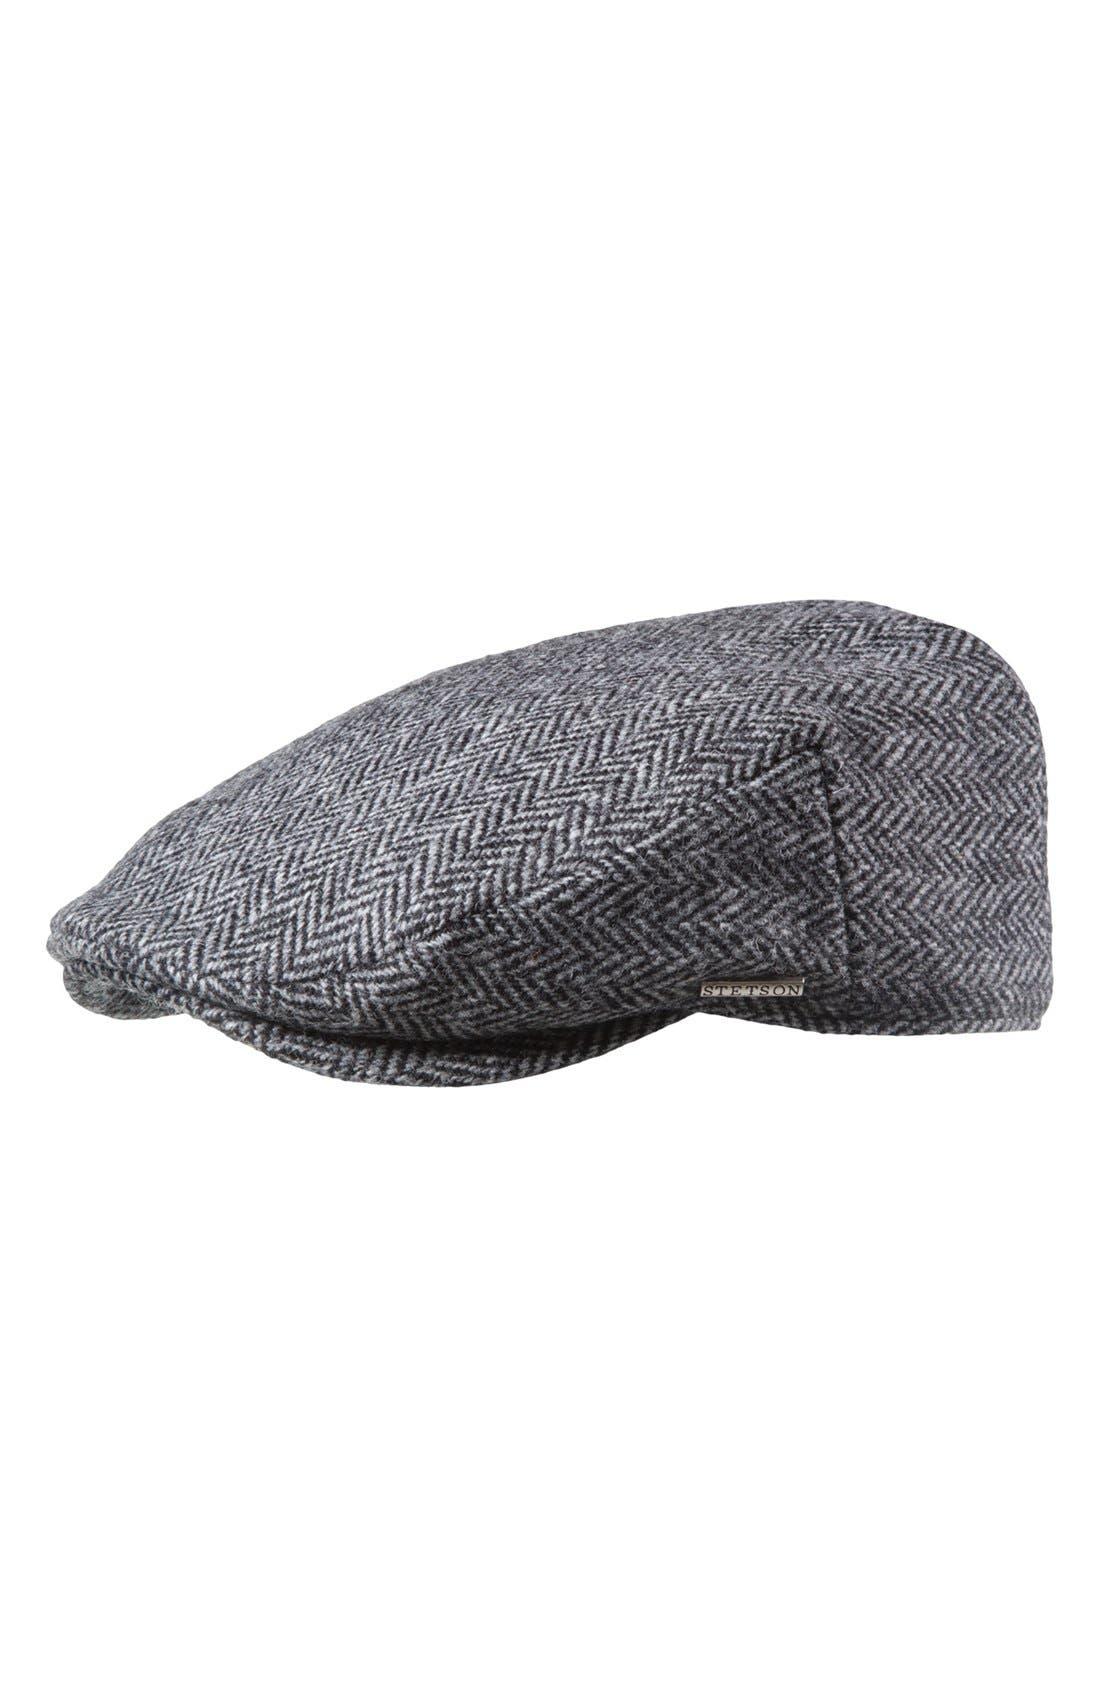 Alternate Image 1 Selected - Stetson Harris Tweed Driving Cap